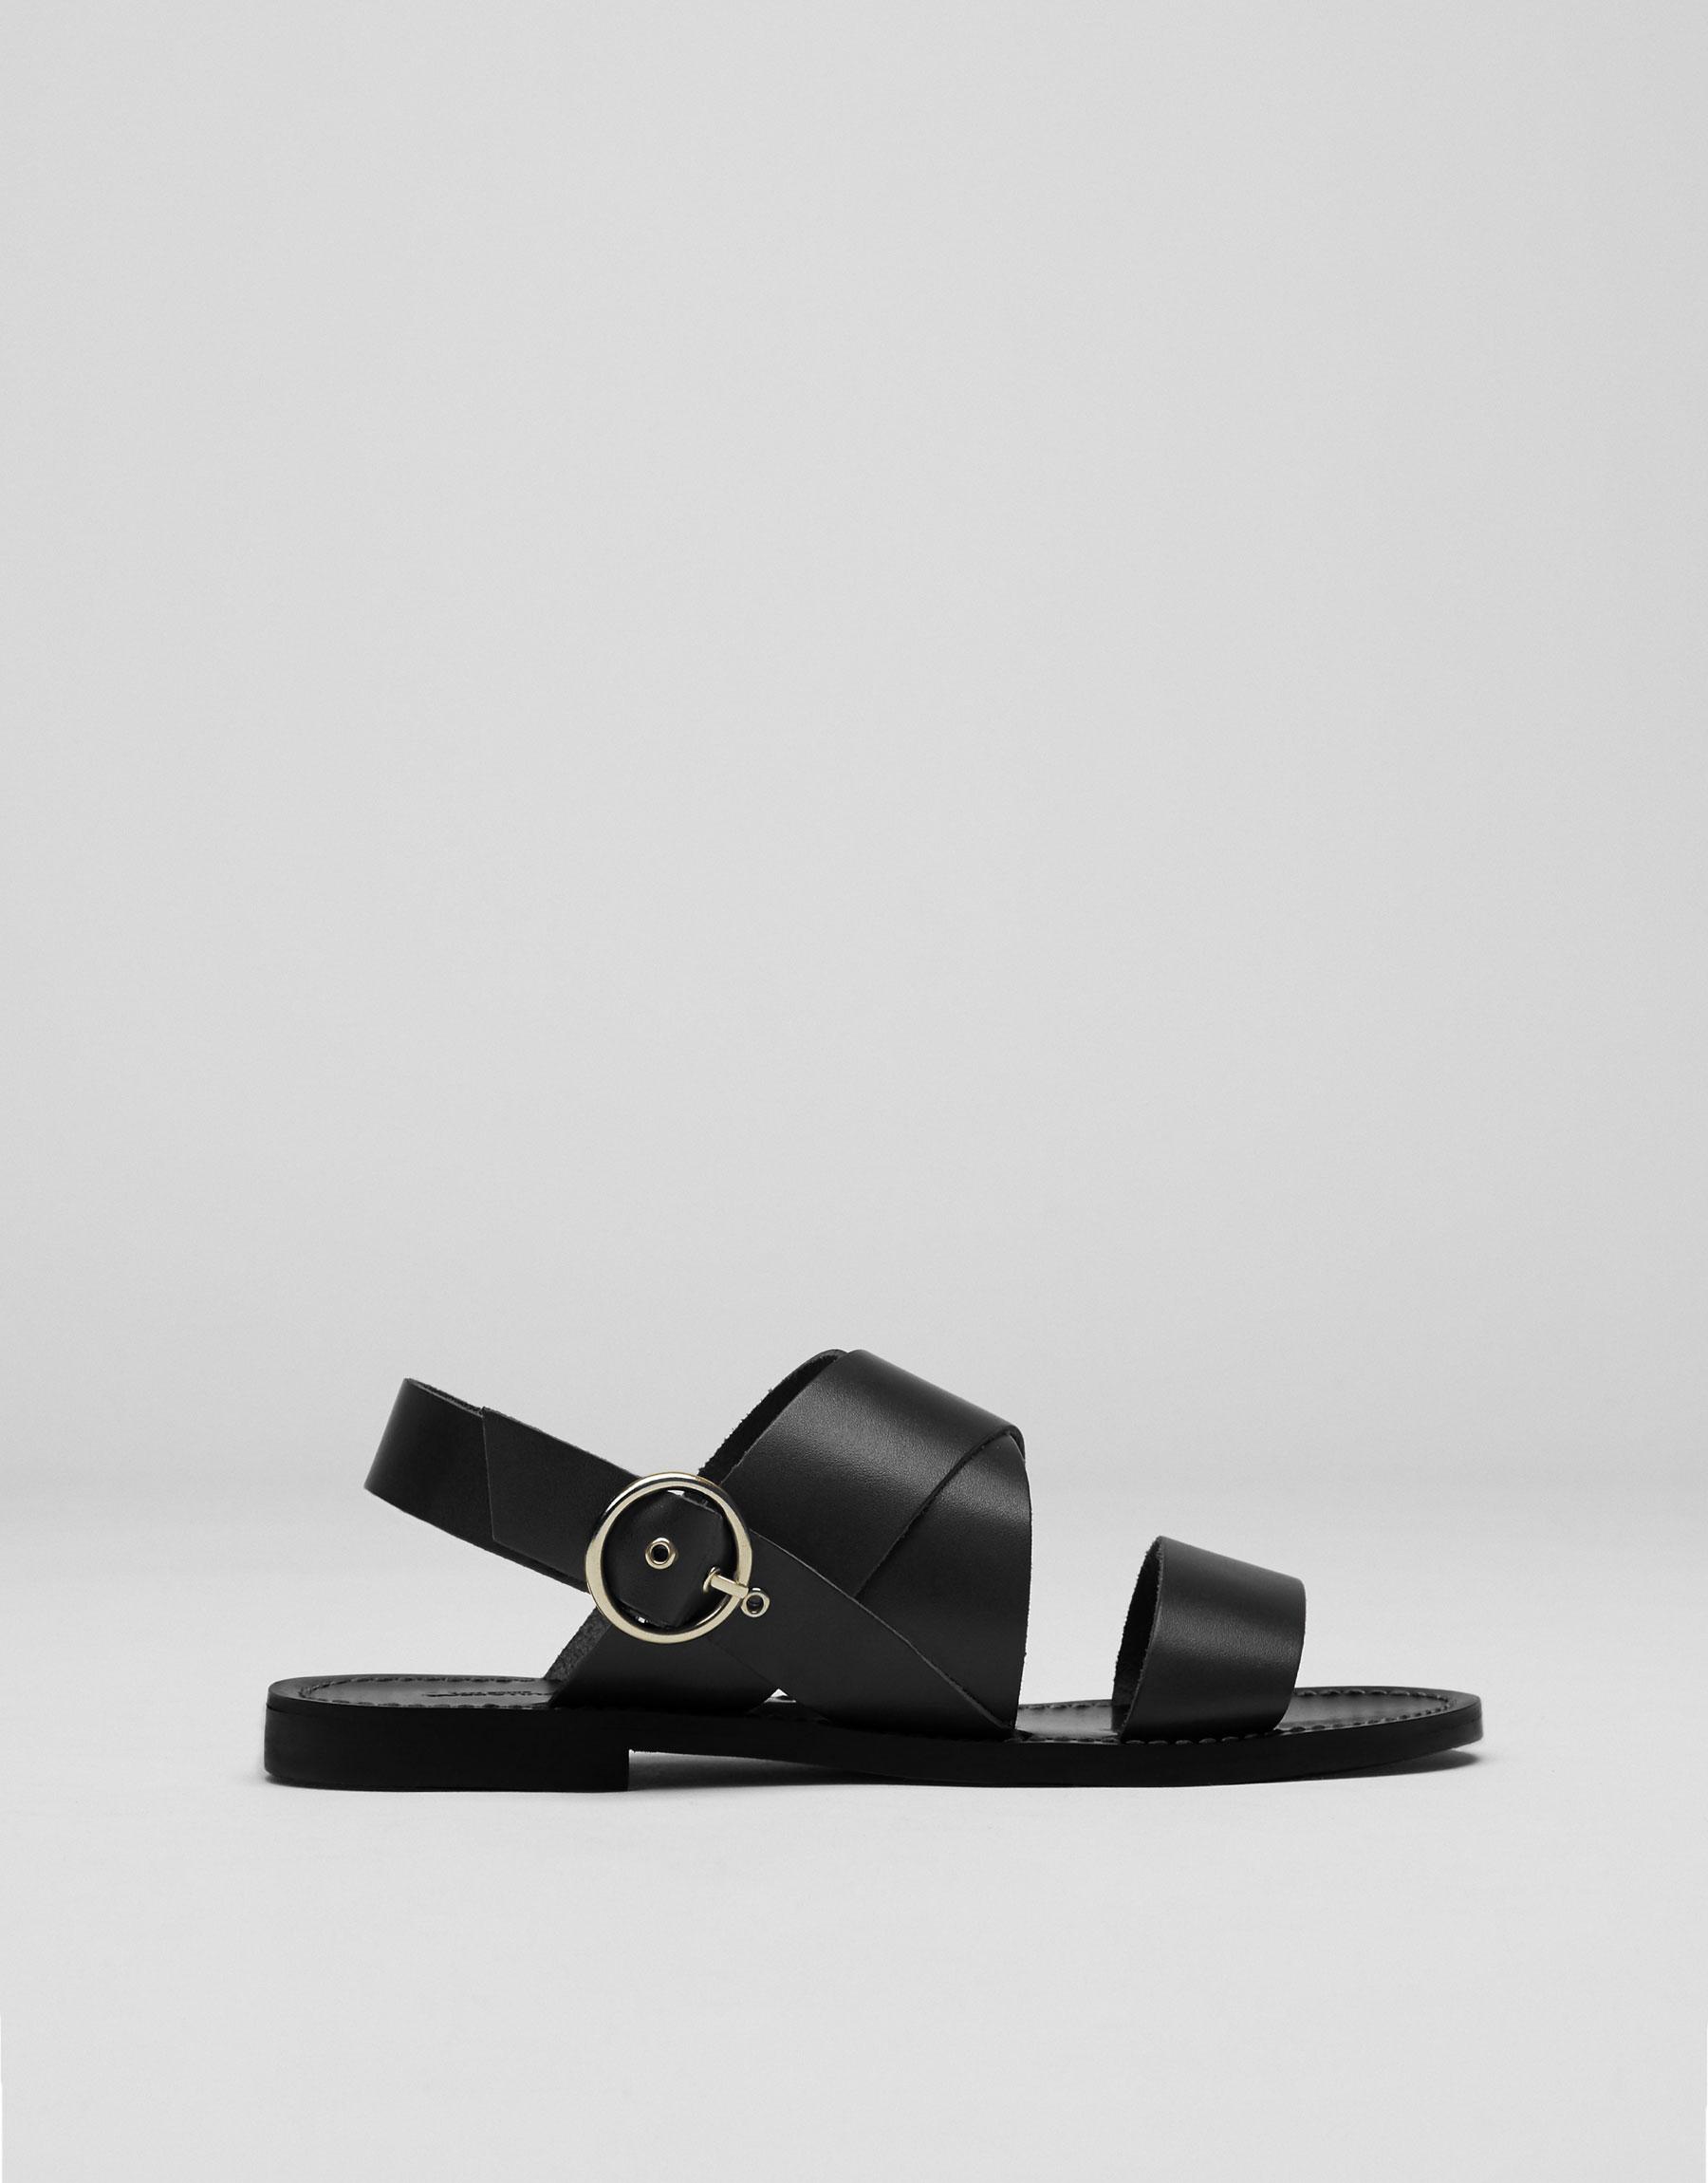 Zwarte zachte leren sandaal